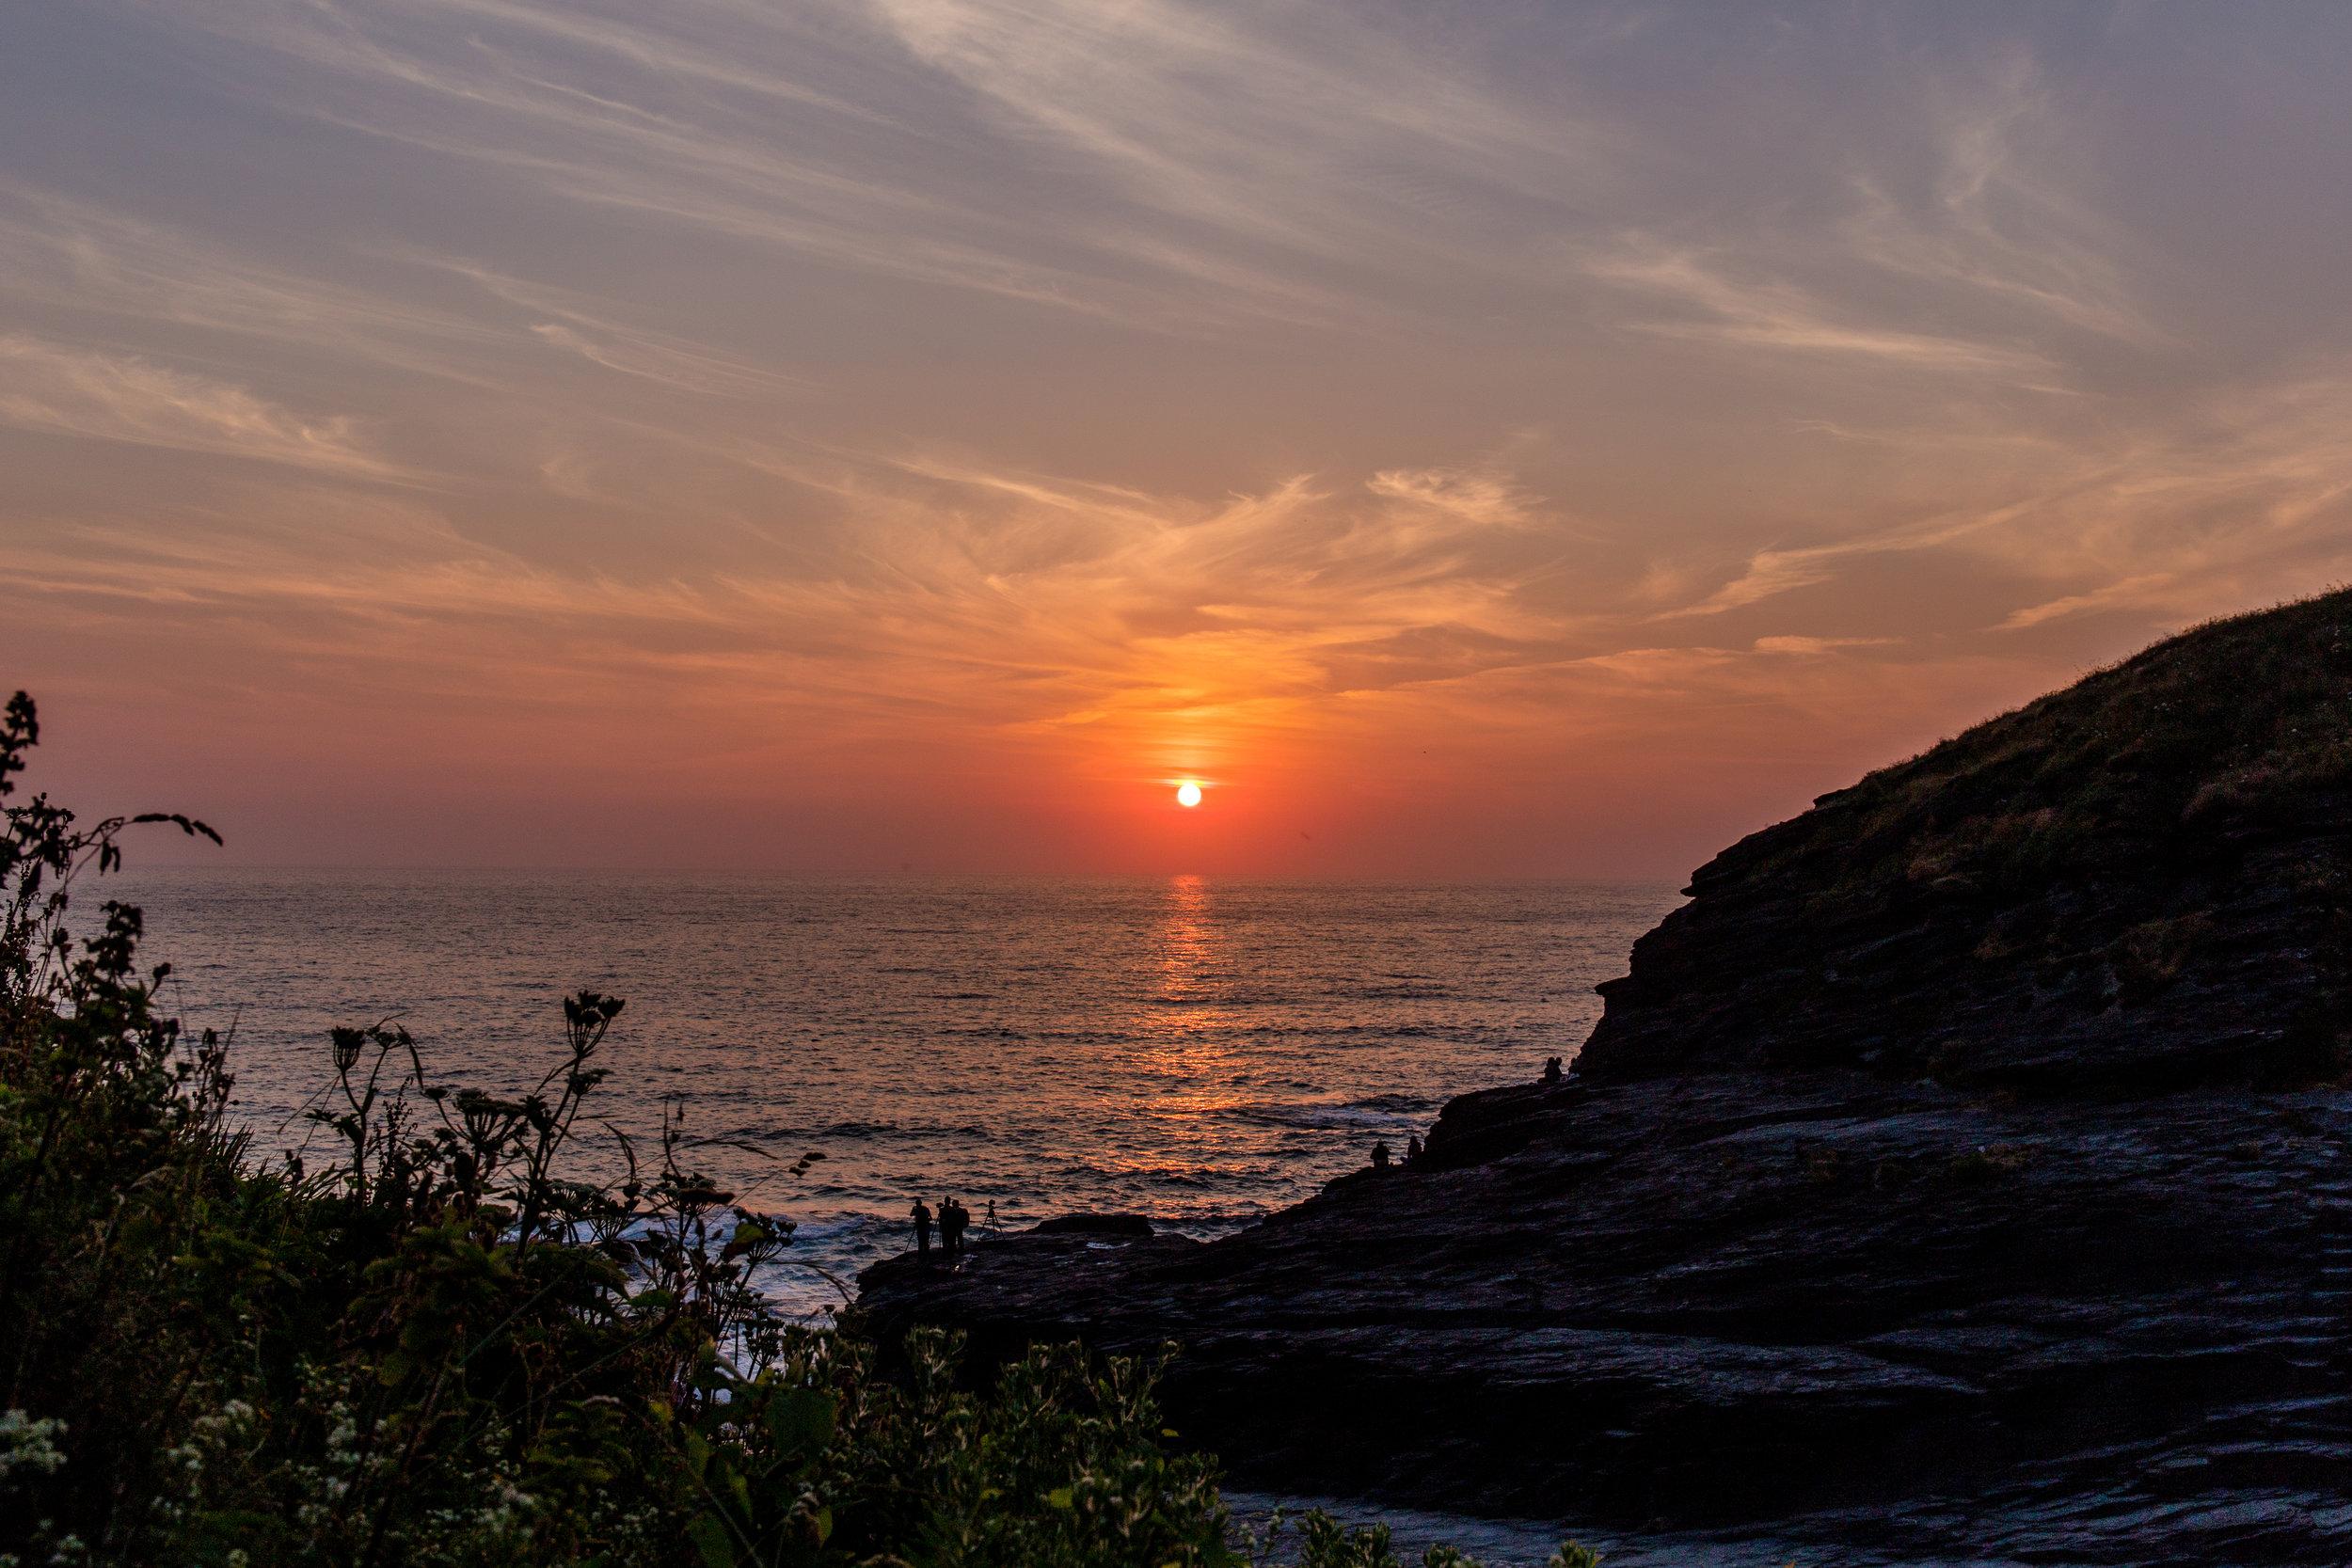 Sunset from Trebarwith Strand